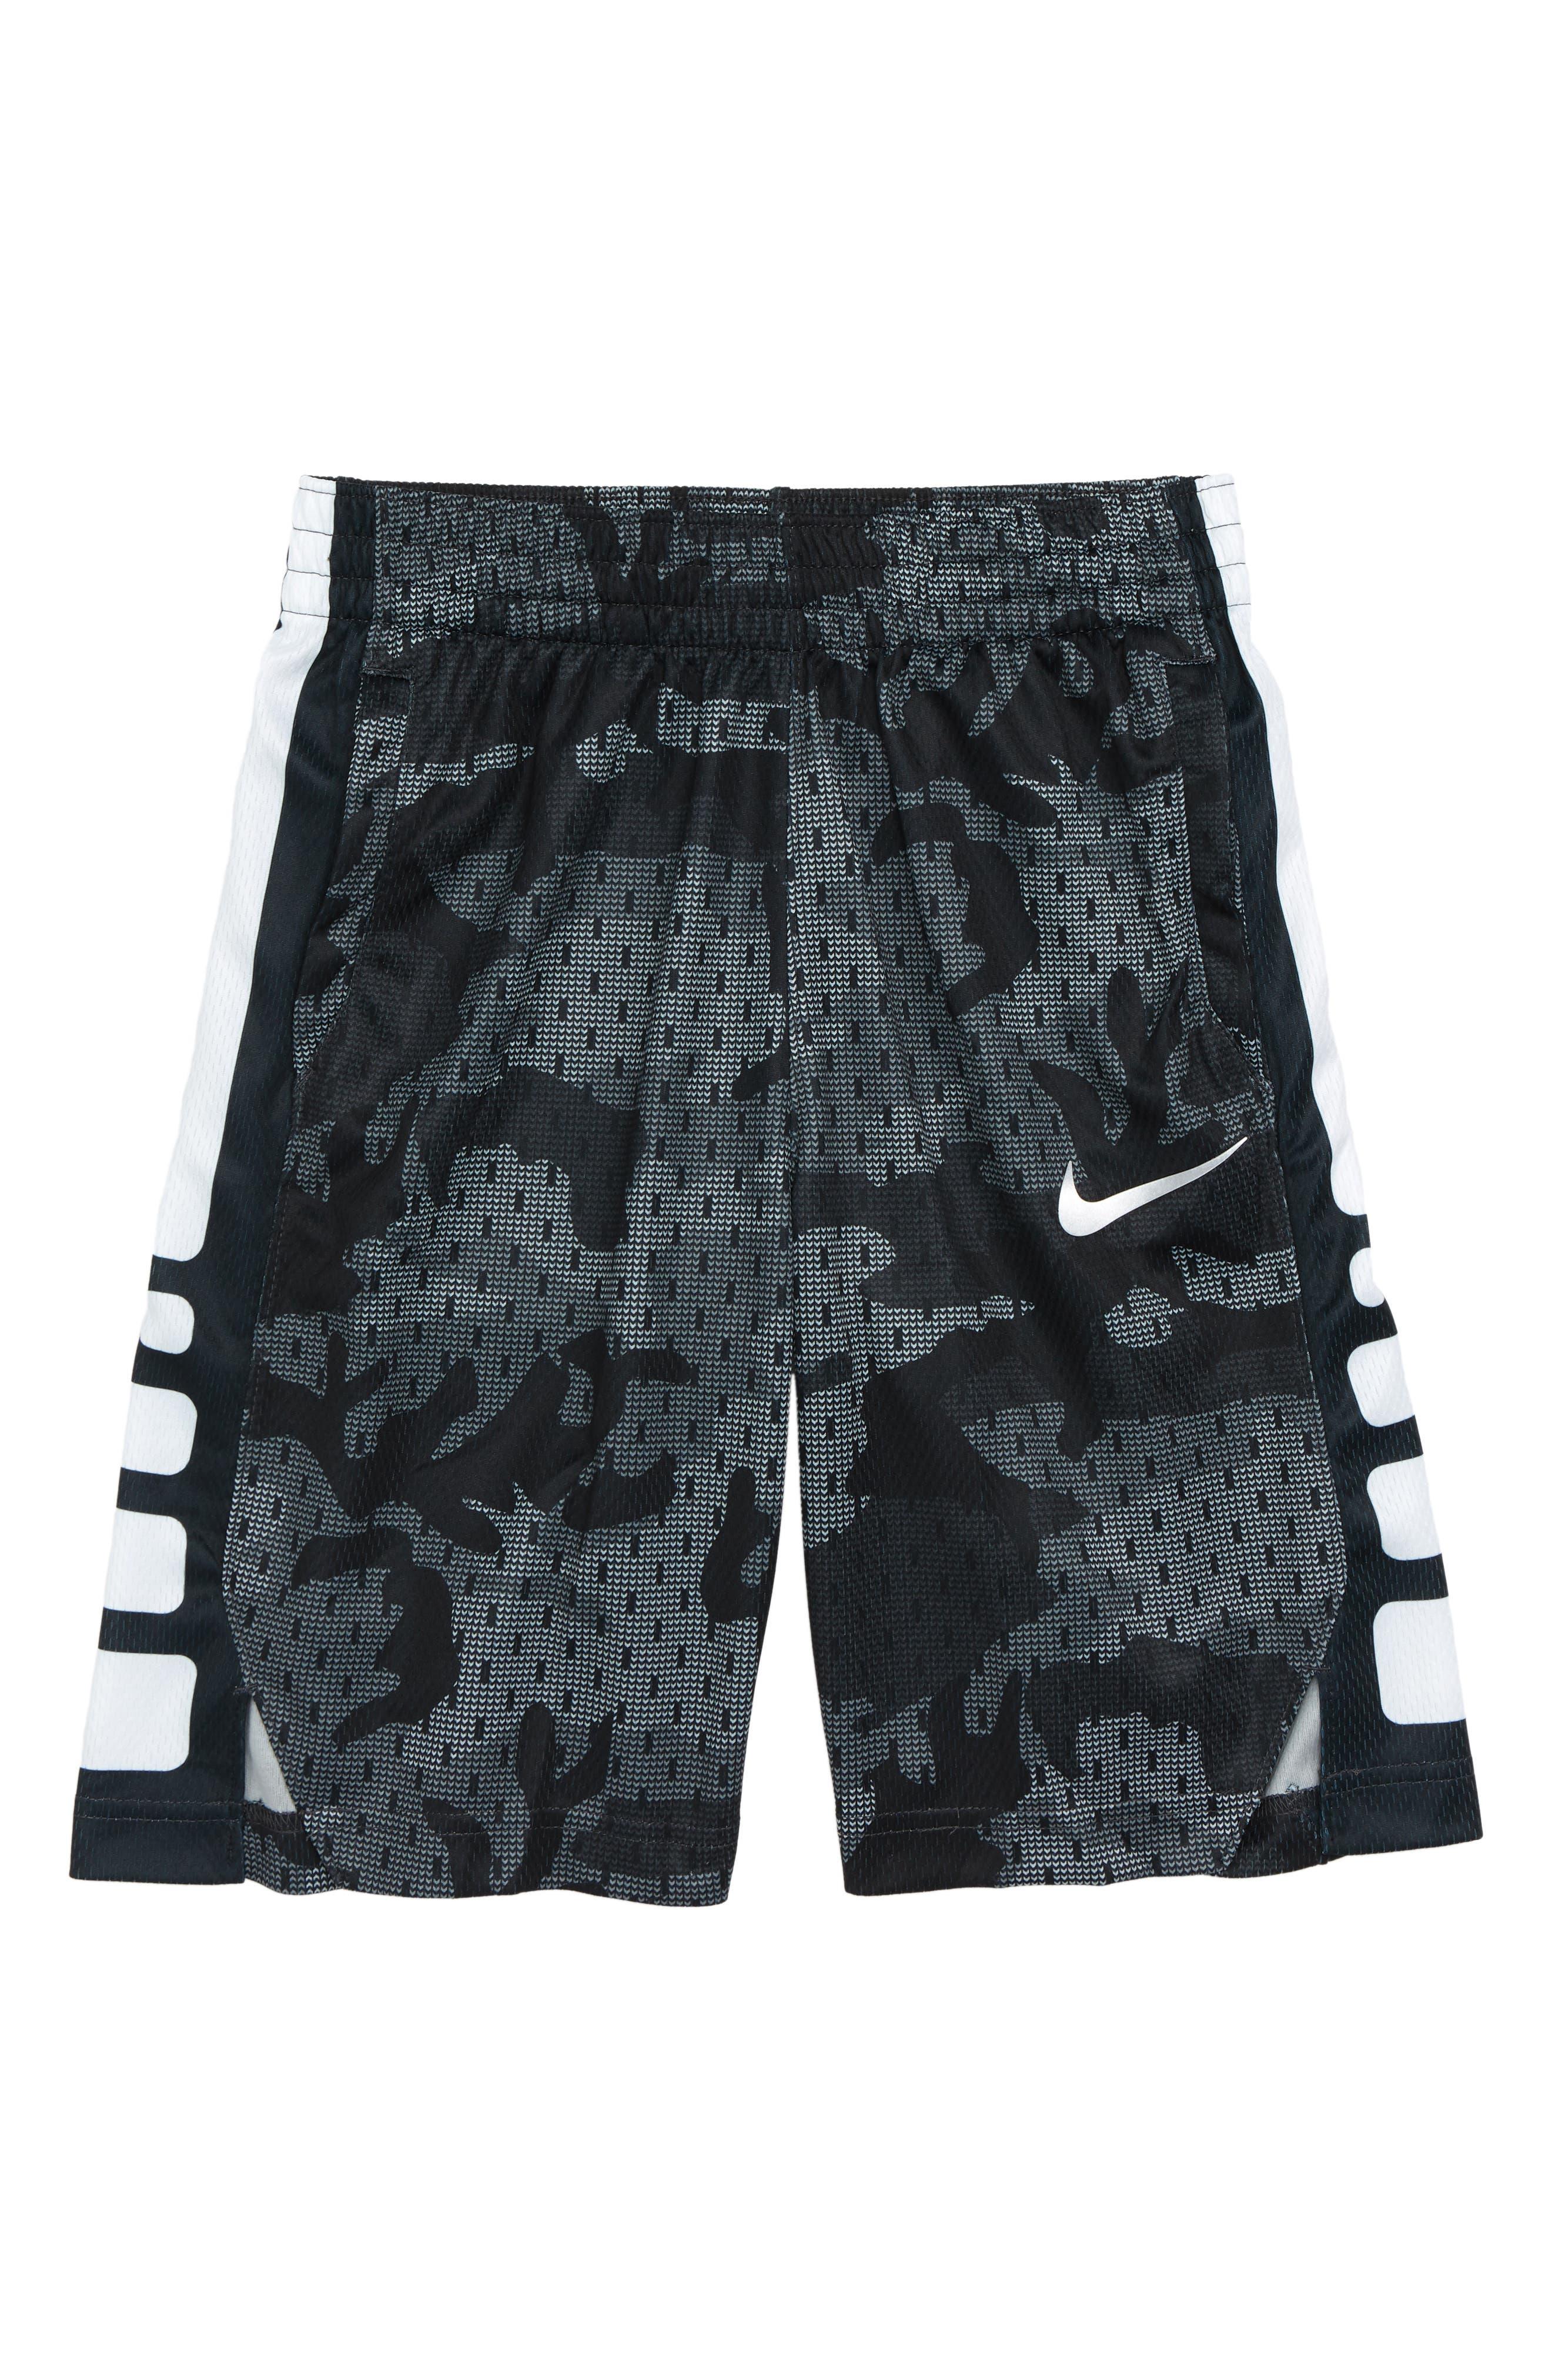 NIKE, Dry Elite Basketball Shorts, Main thumbnail 1, color, 020